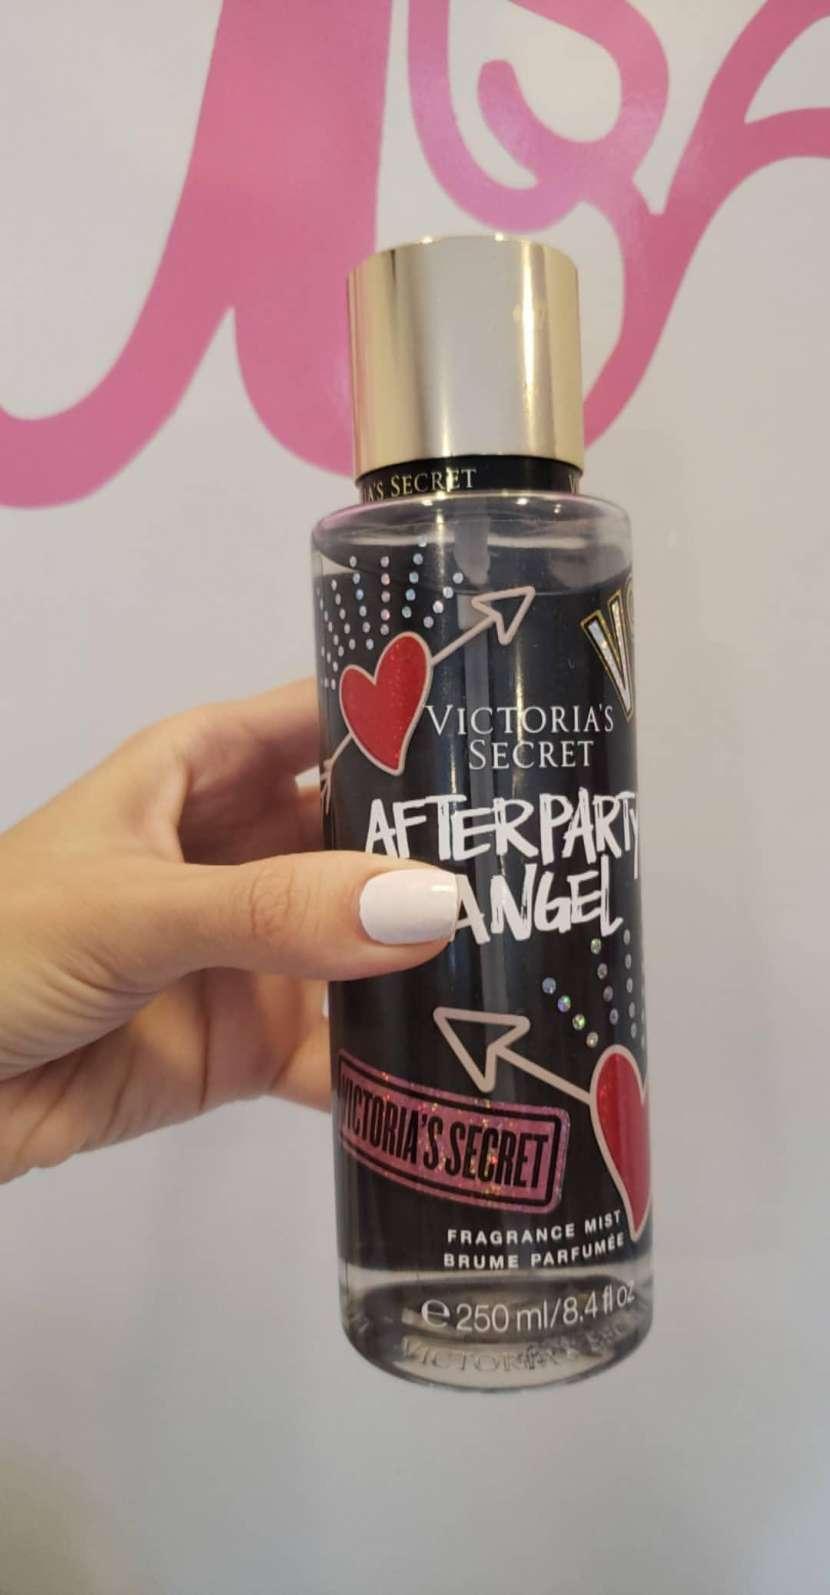 Perfume Locion Body splash vs Victoria's secrer pink - 4